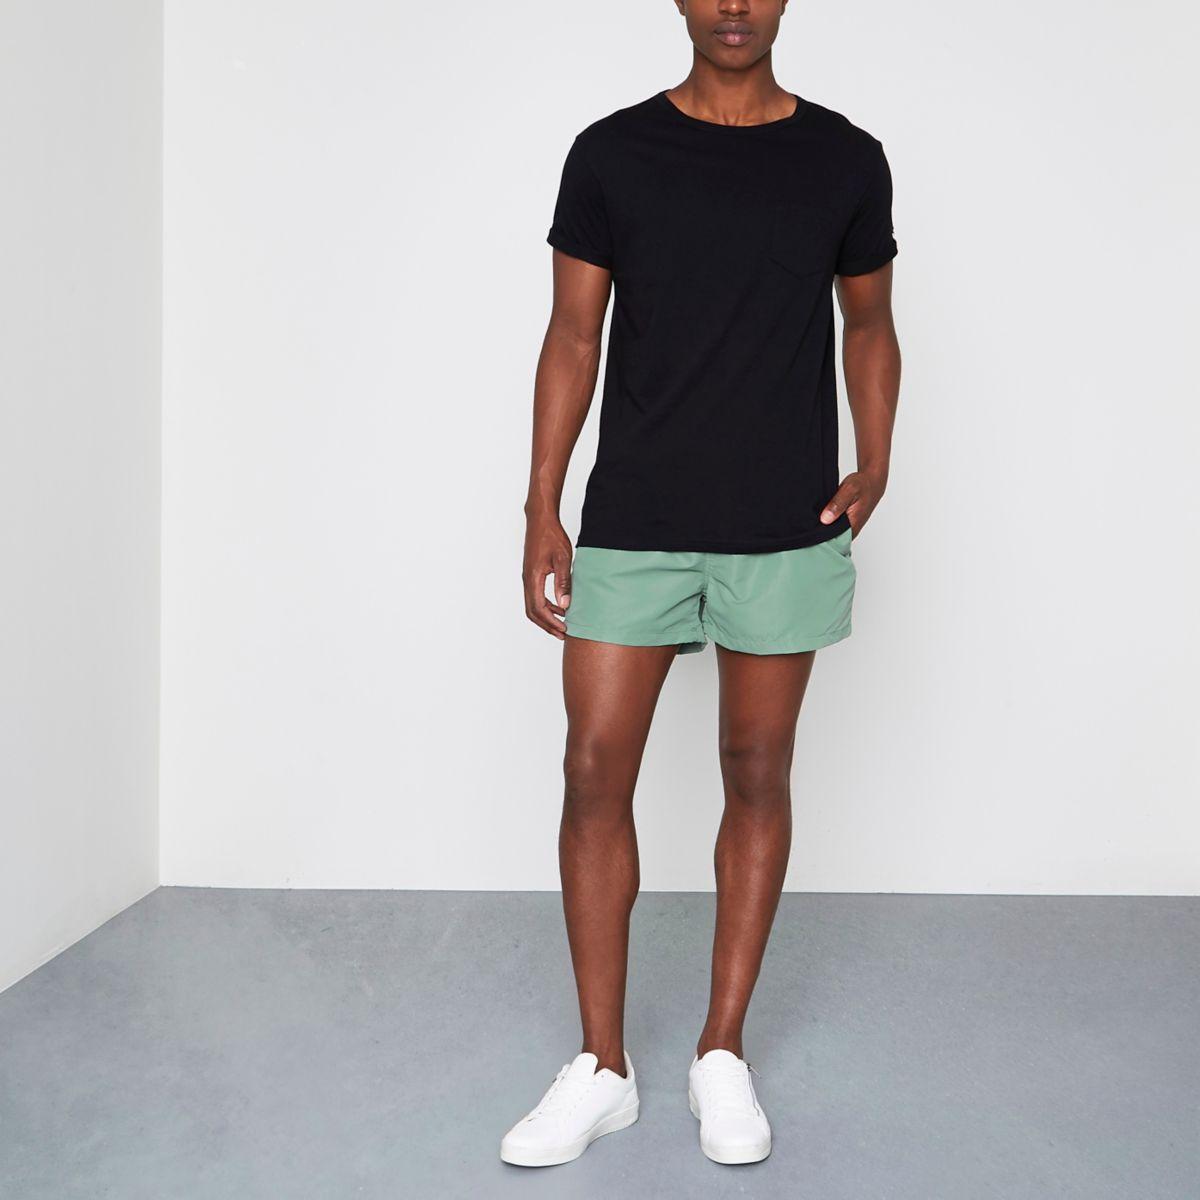 Olive green swim shorts